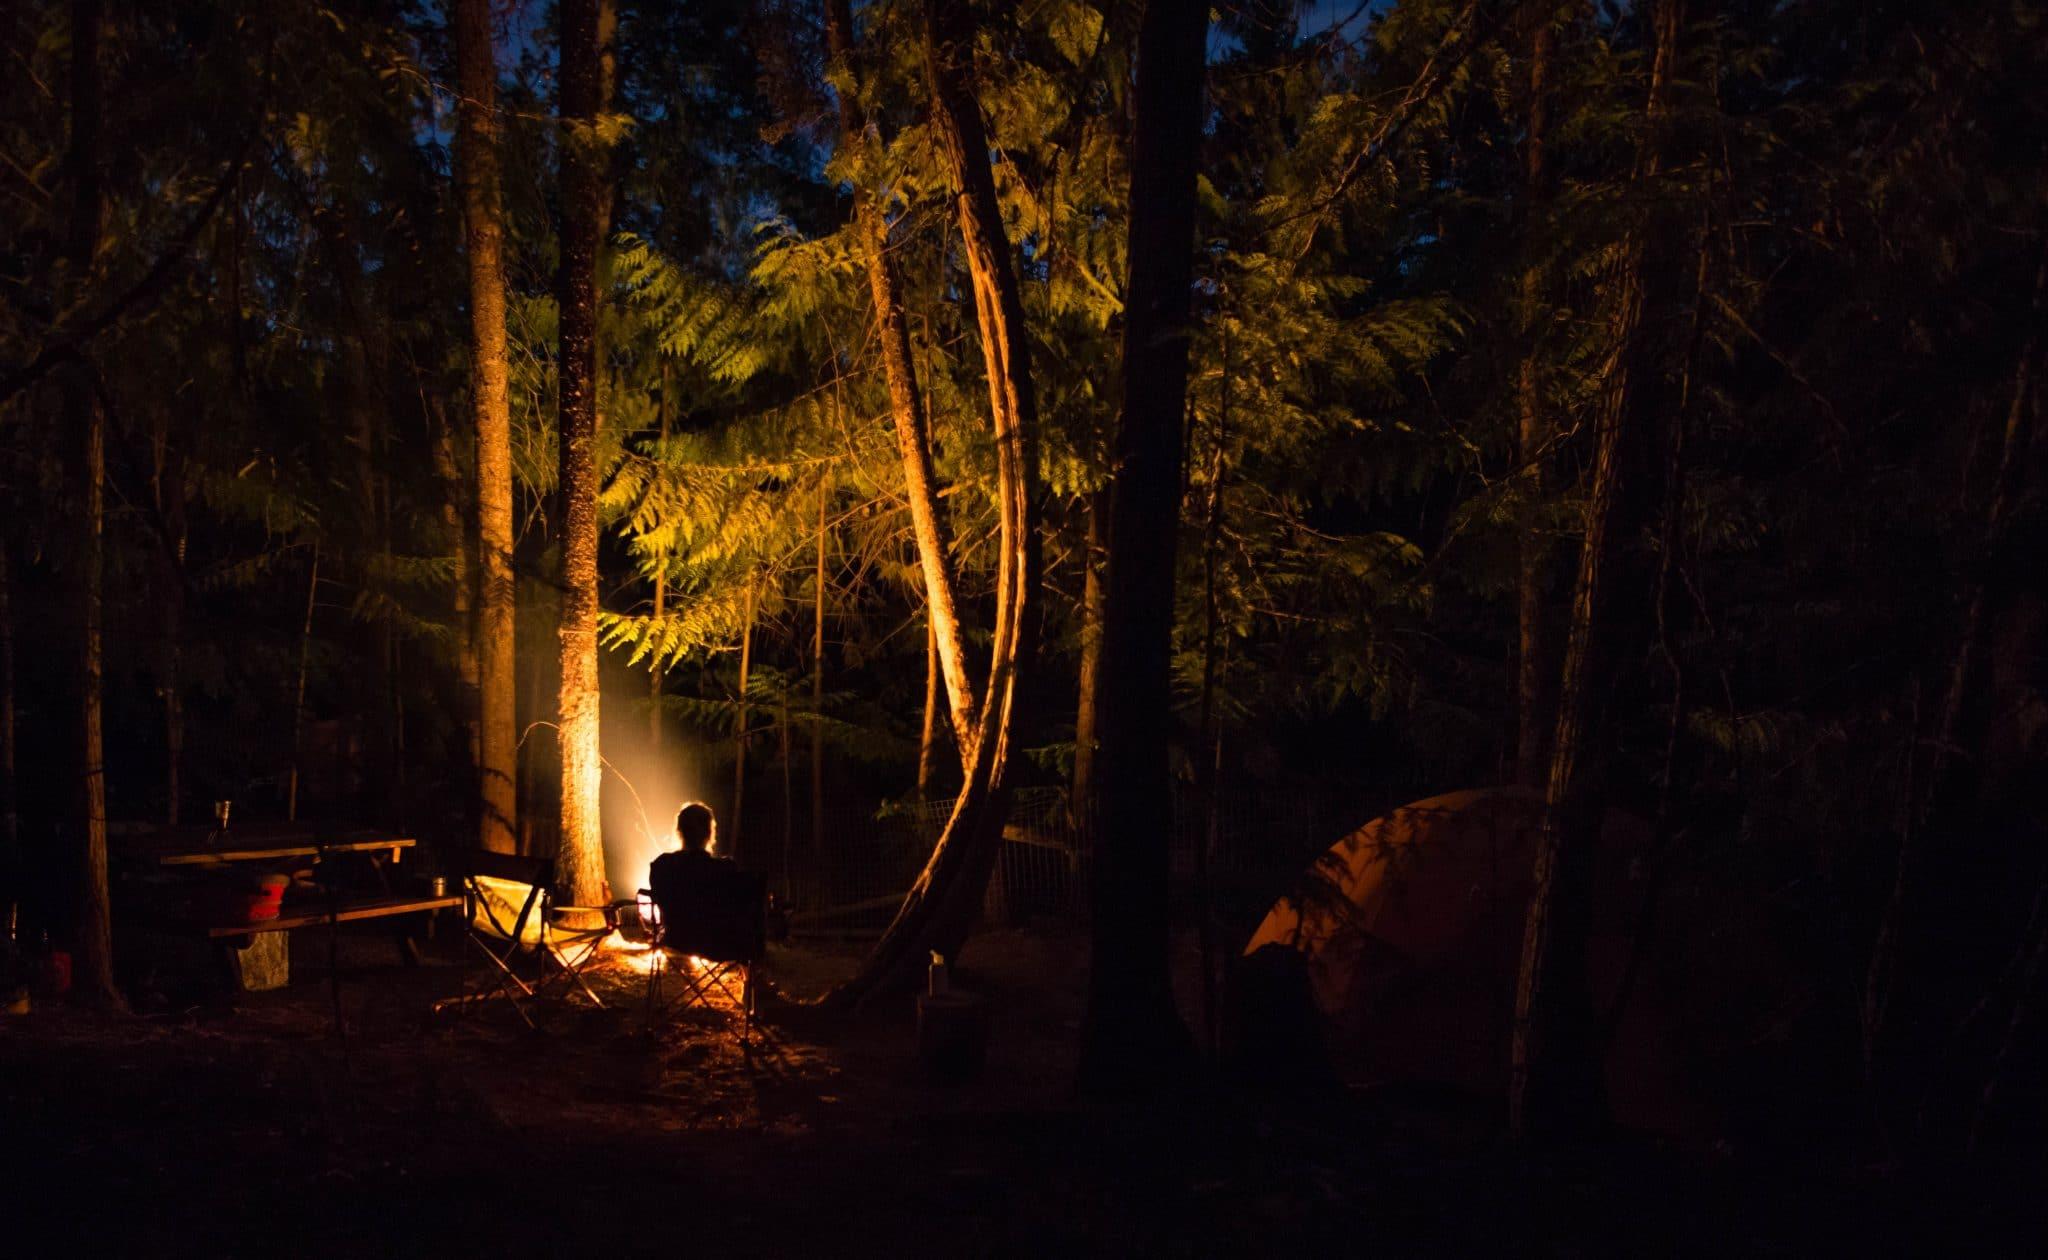 Enjoying the campfire in Vernon, BC